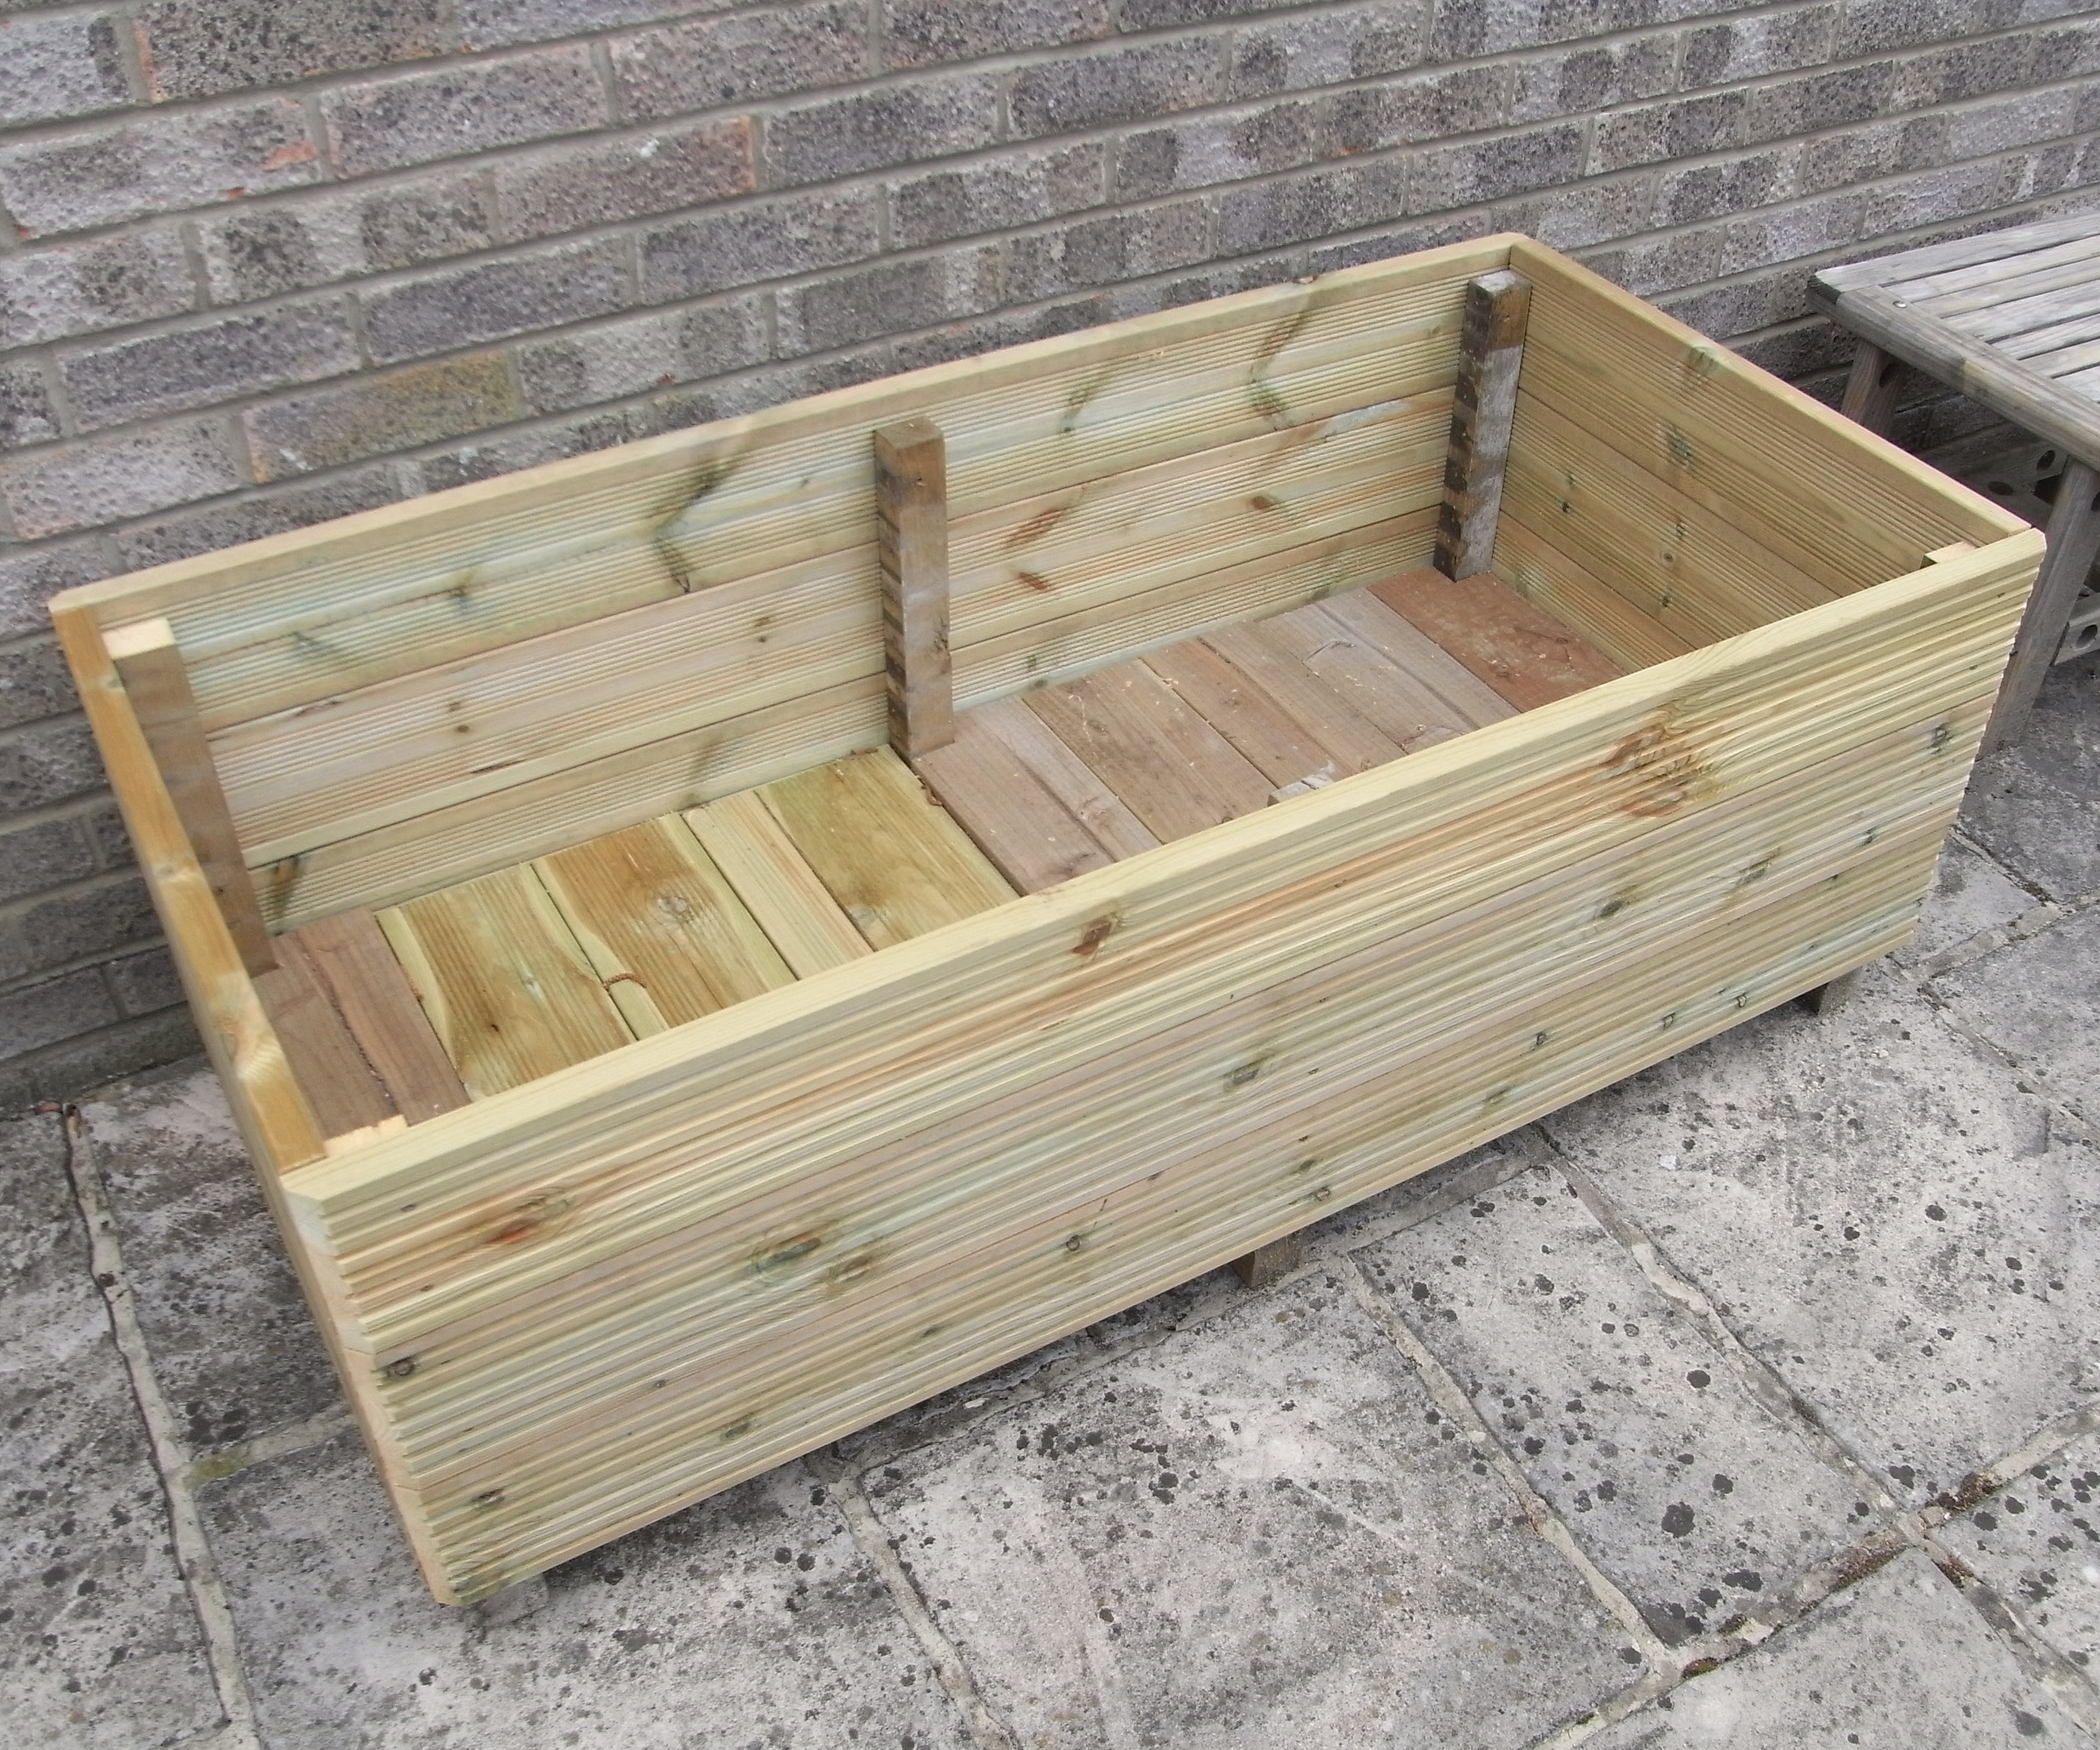 Large 1 Metre Wooden Garden Planter Box Trough Herb: Make A Garden Planter From Decking